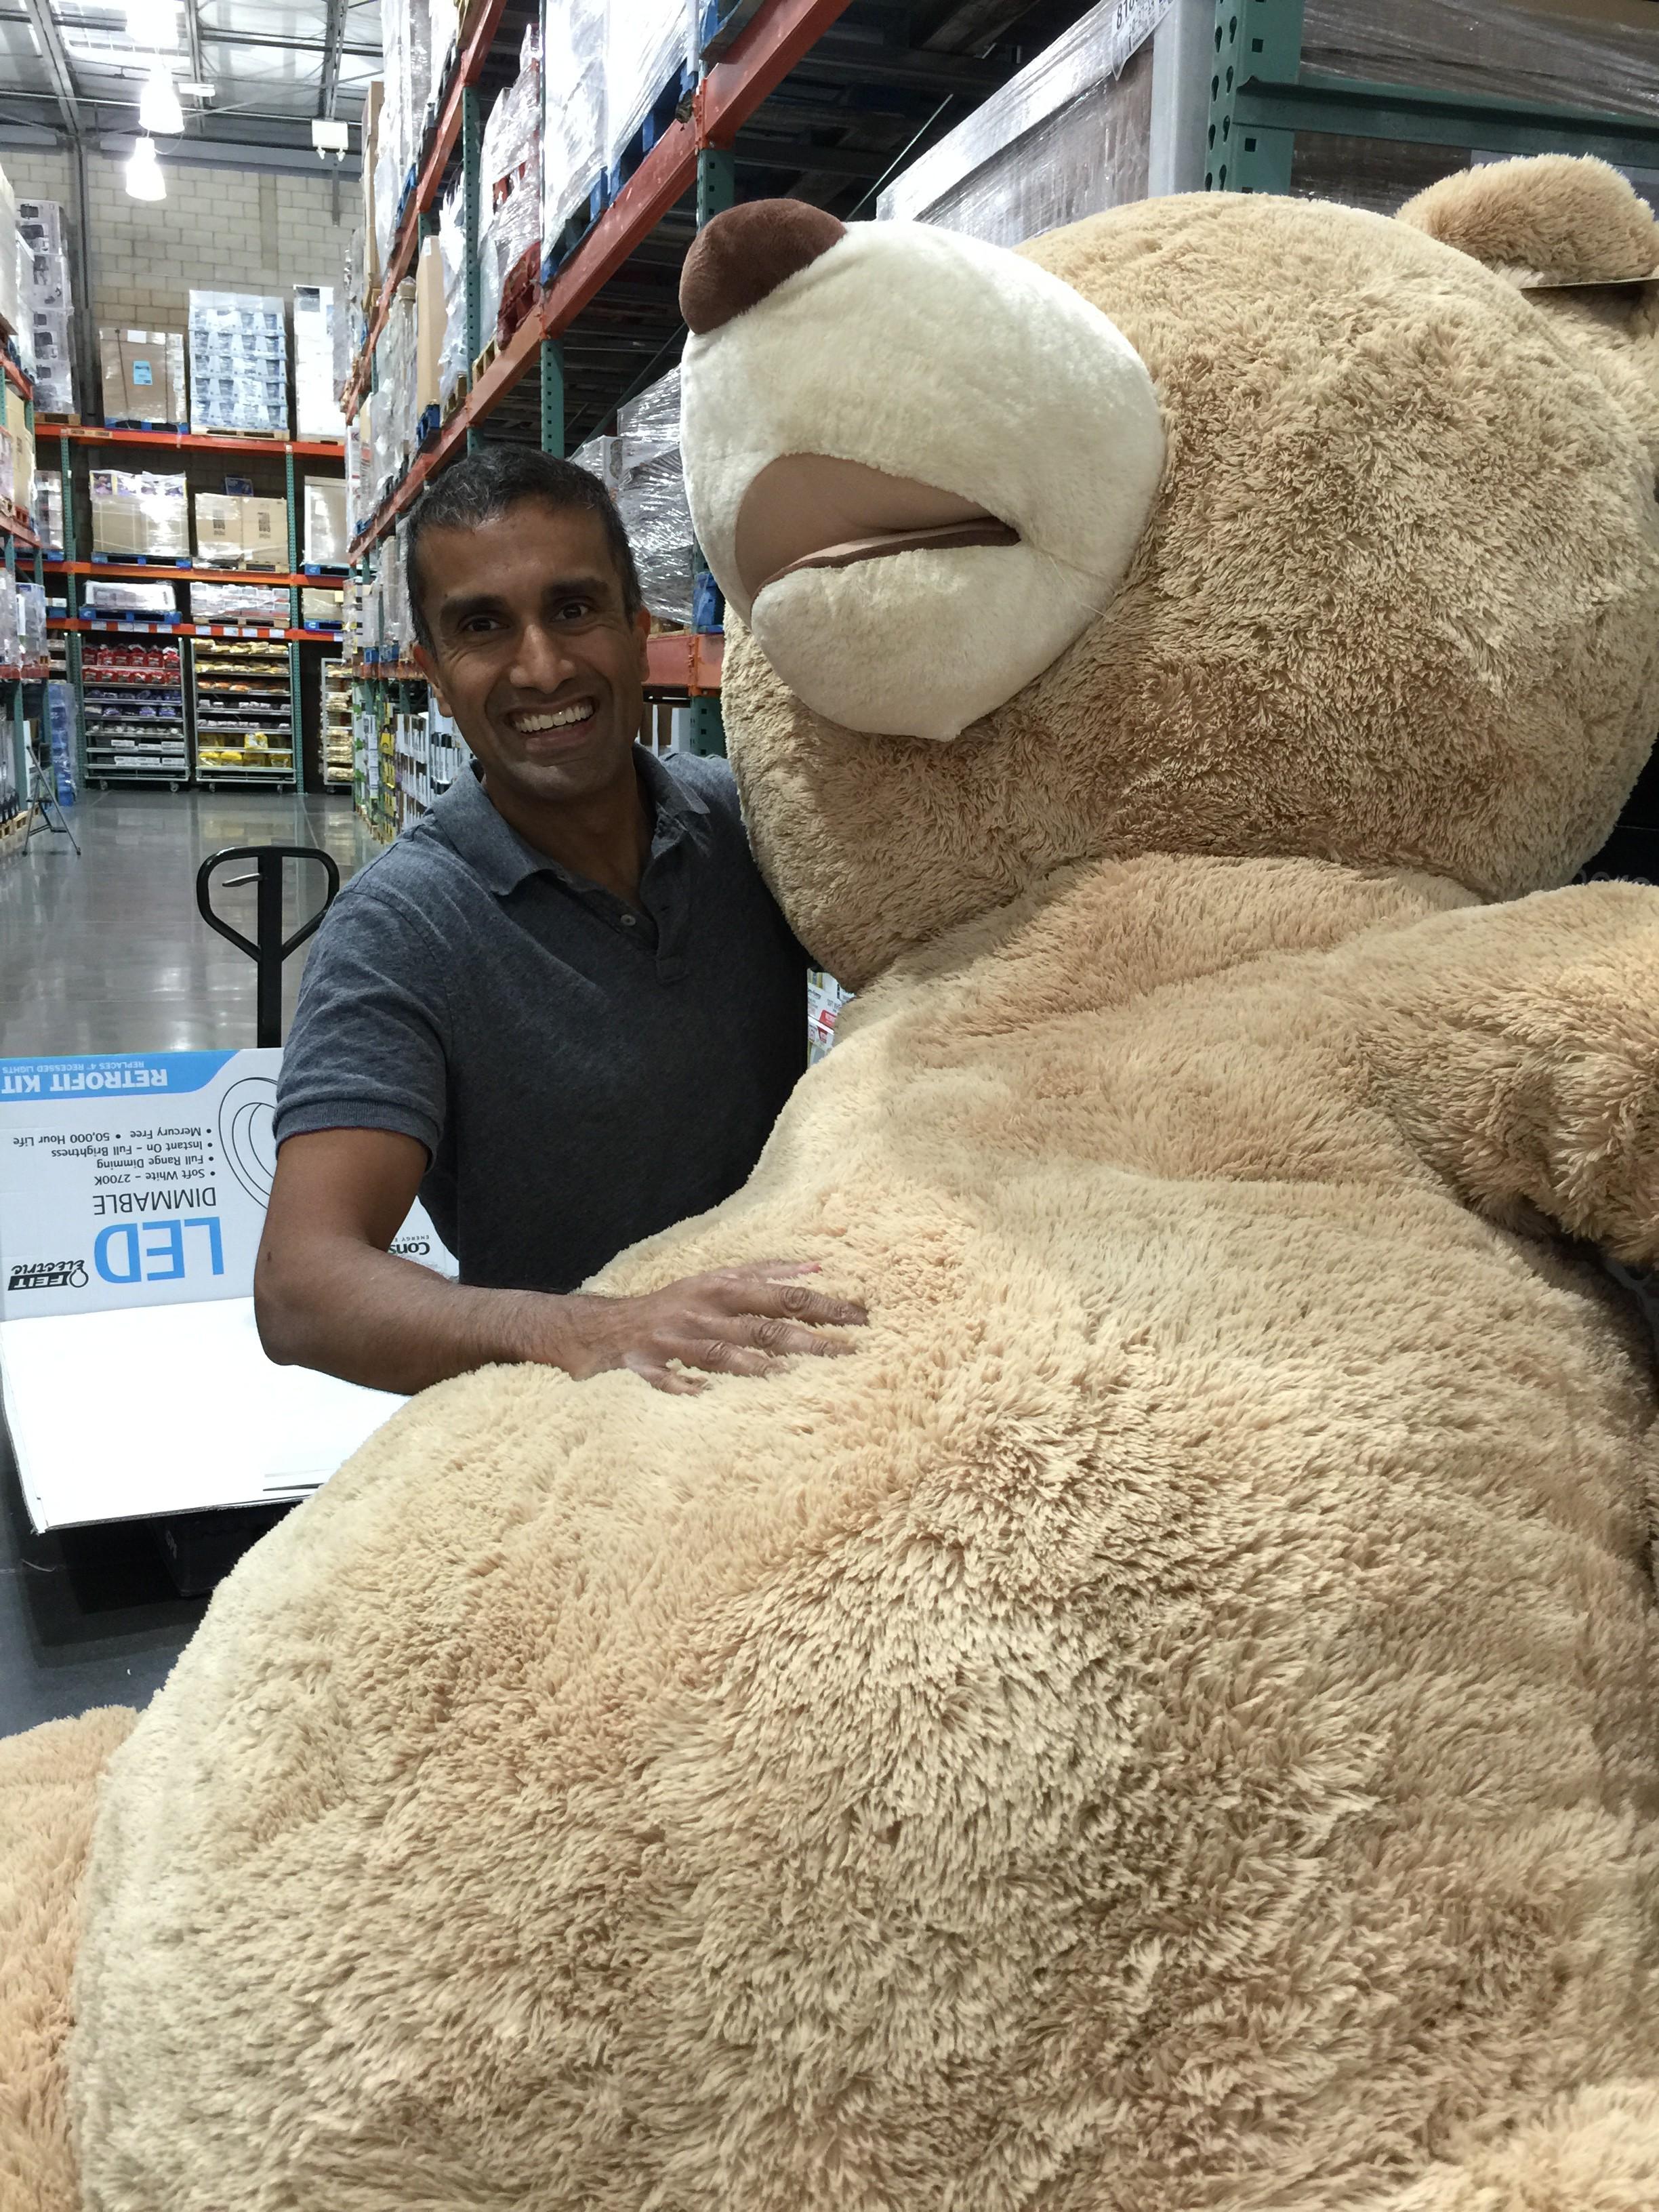 For my birthday, Deepak got me this enormous plush!